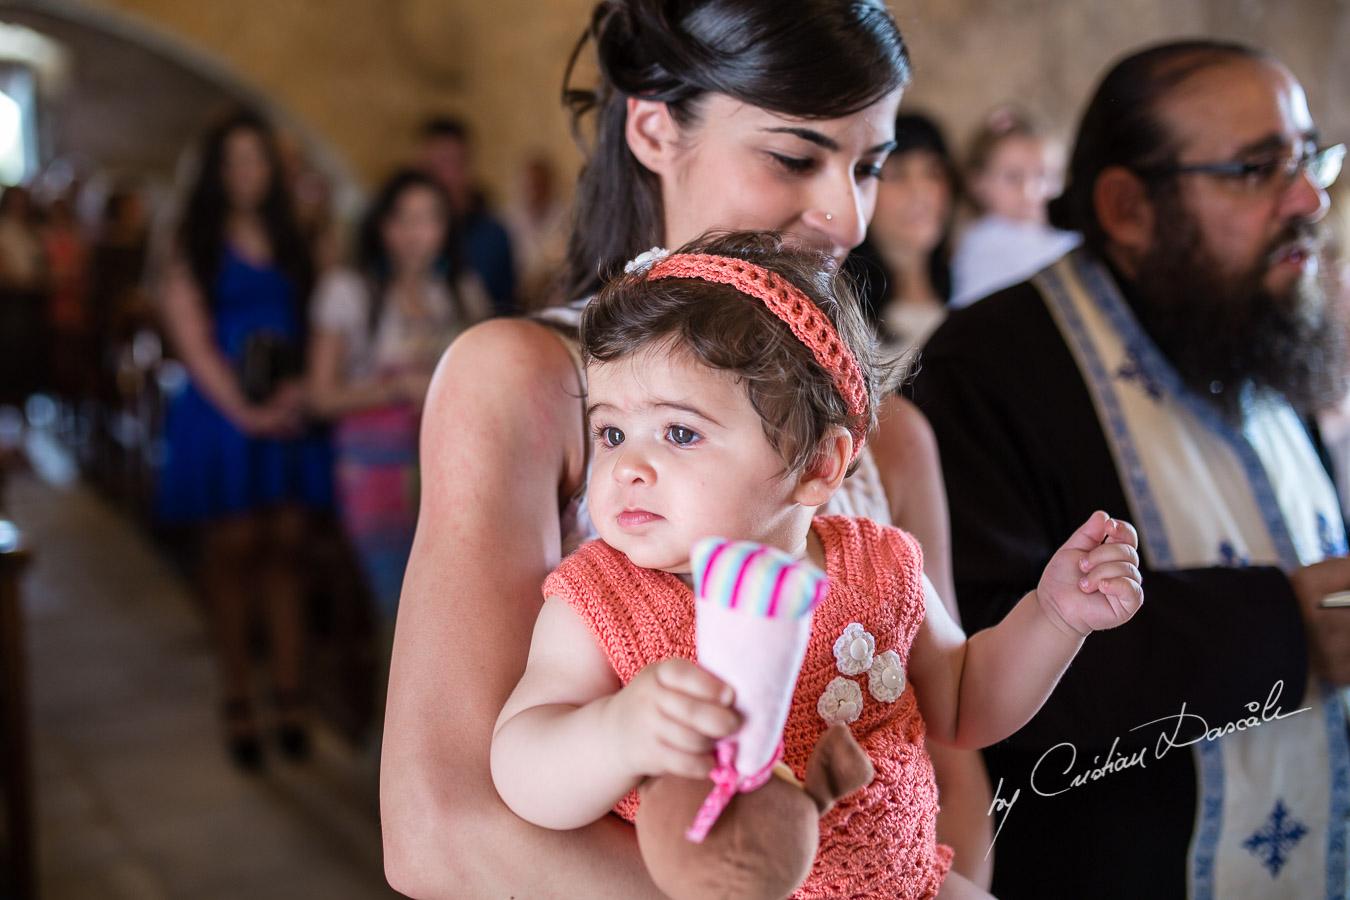 Joyous Christening in Limassol - 20